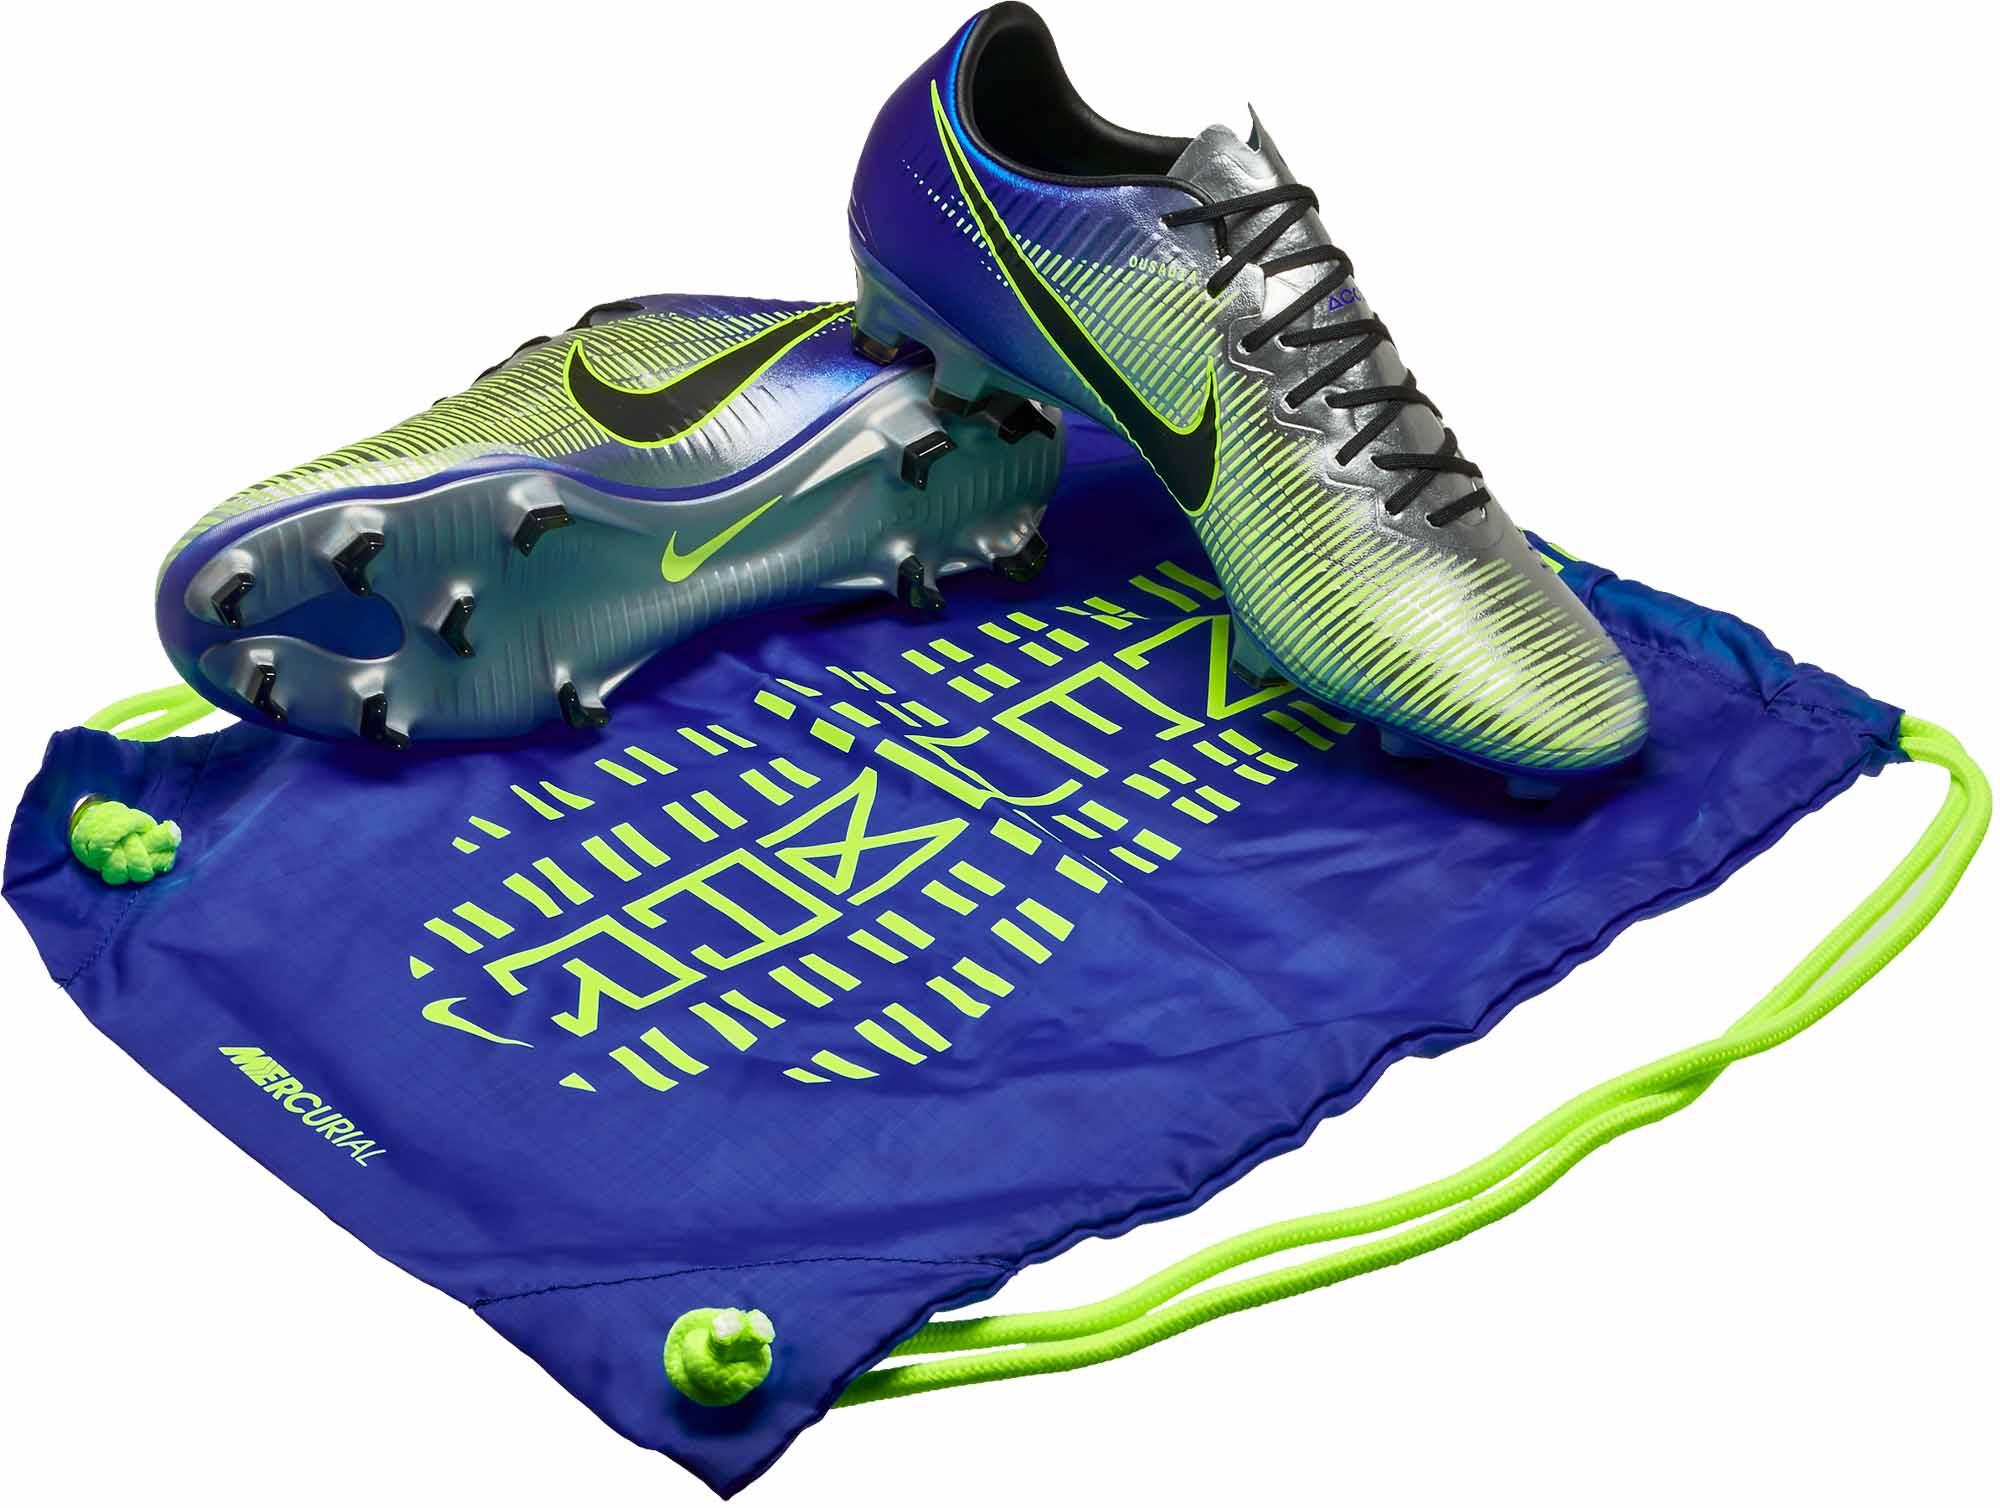 reputable site 3eaad af818 Nike Mercurial Vapor XI FG - Neymar Jr - Racer Blue & Chrome